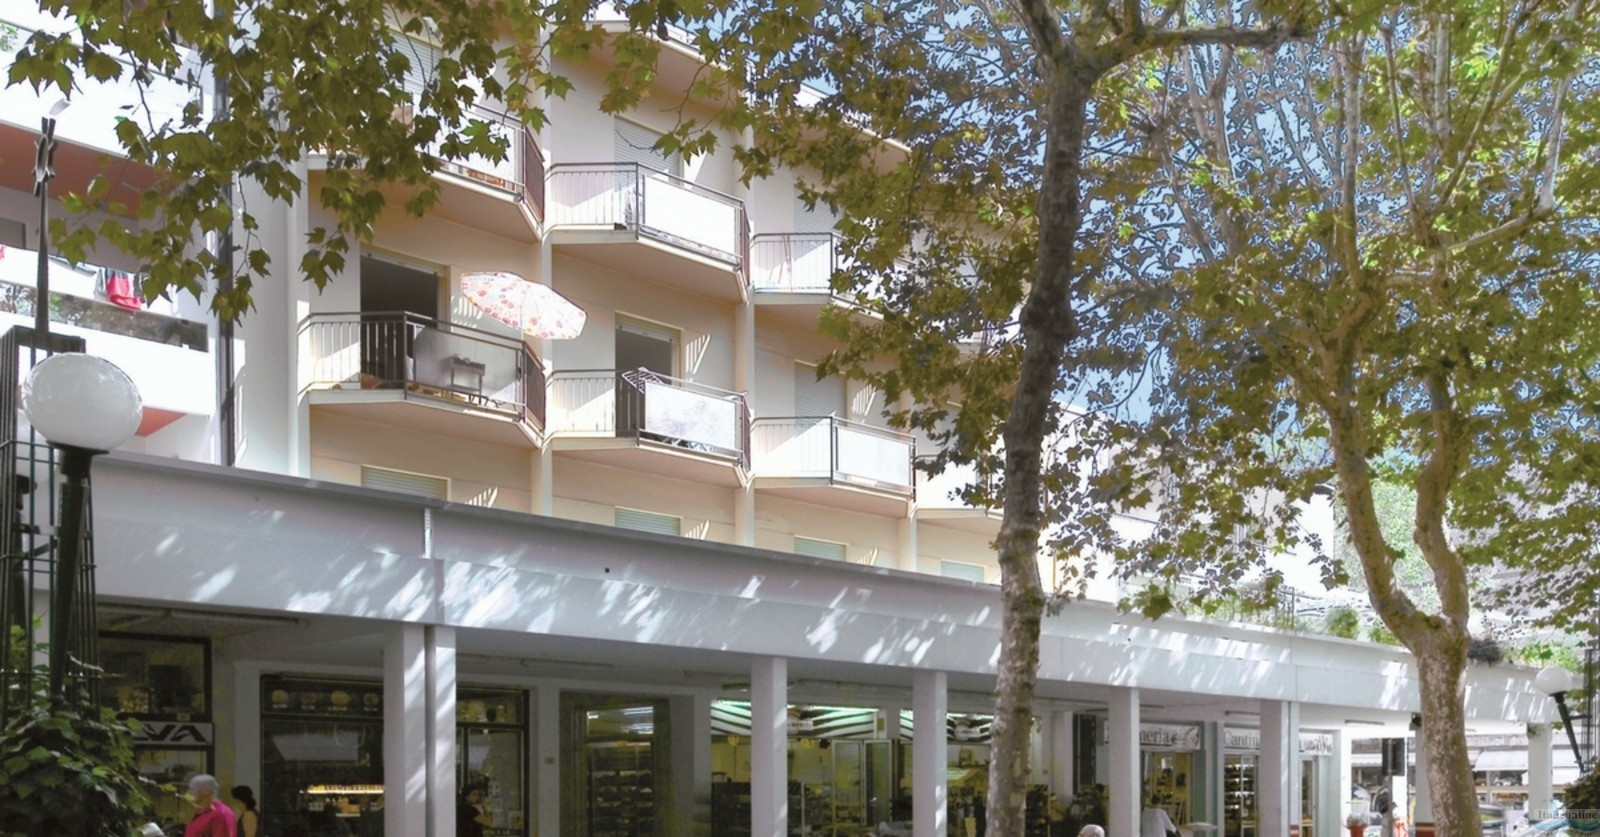 Appartamenti Furlan Bibione Spiaggia Italy Italieonline on the british museum collection, trump hotel collection, victoria collection, nice collection, vera wang princess collection, sherri hill collection,